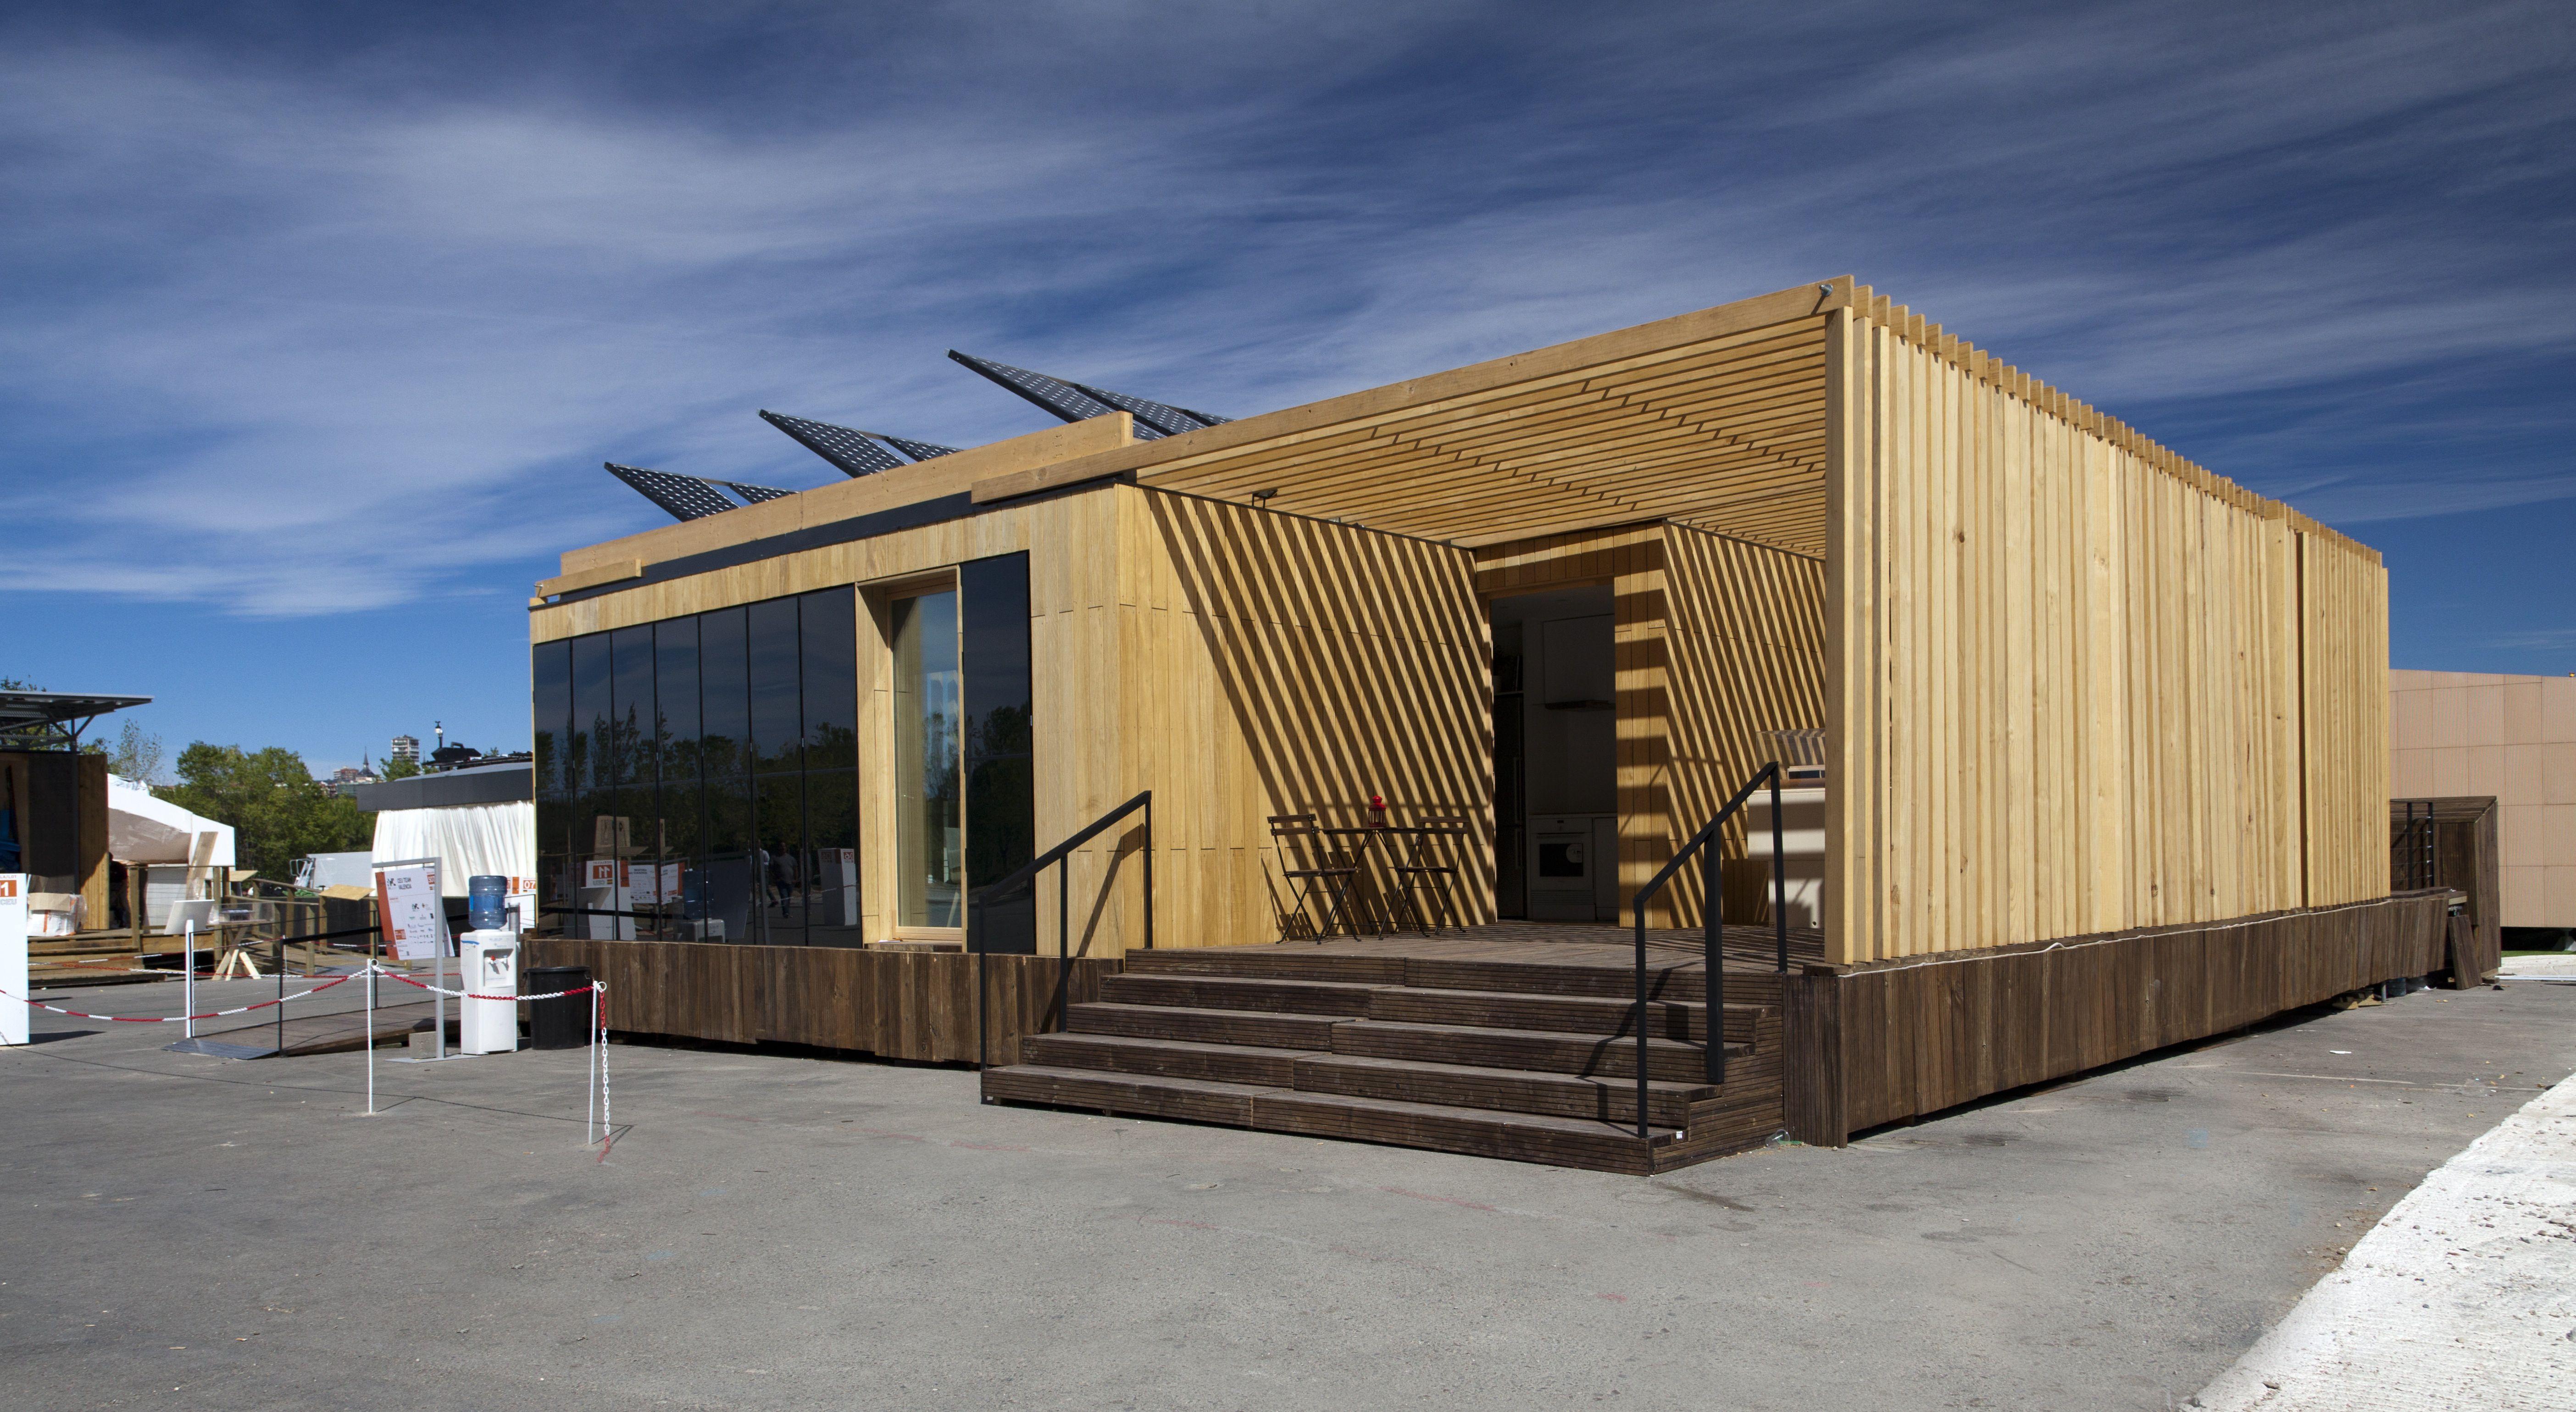 La casa solar smlsystem de la ceu uch cuarta mejor for Arquitectura modular